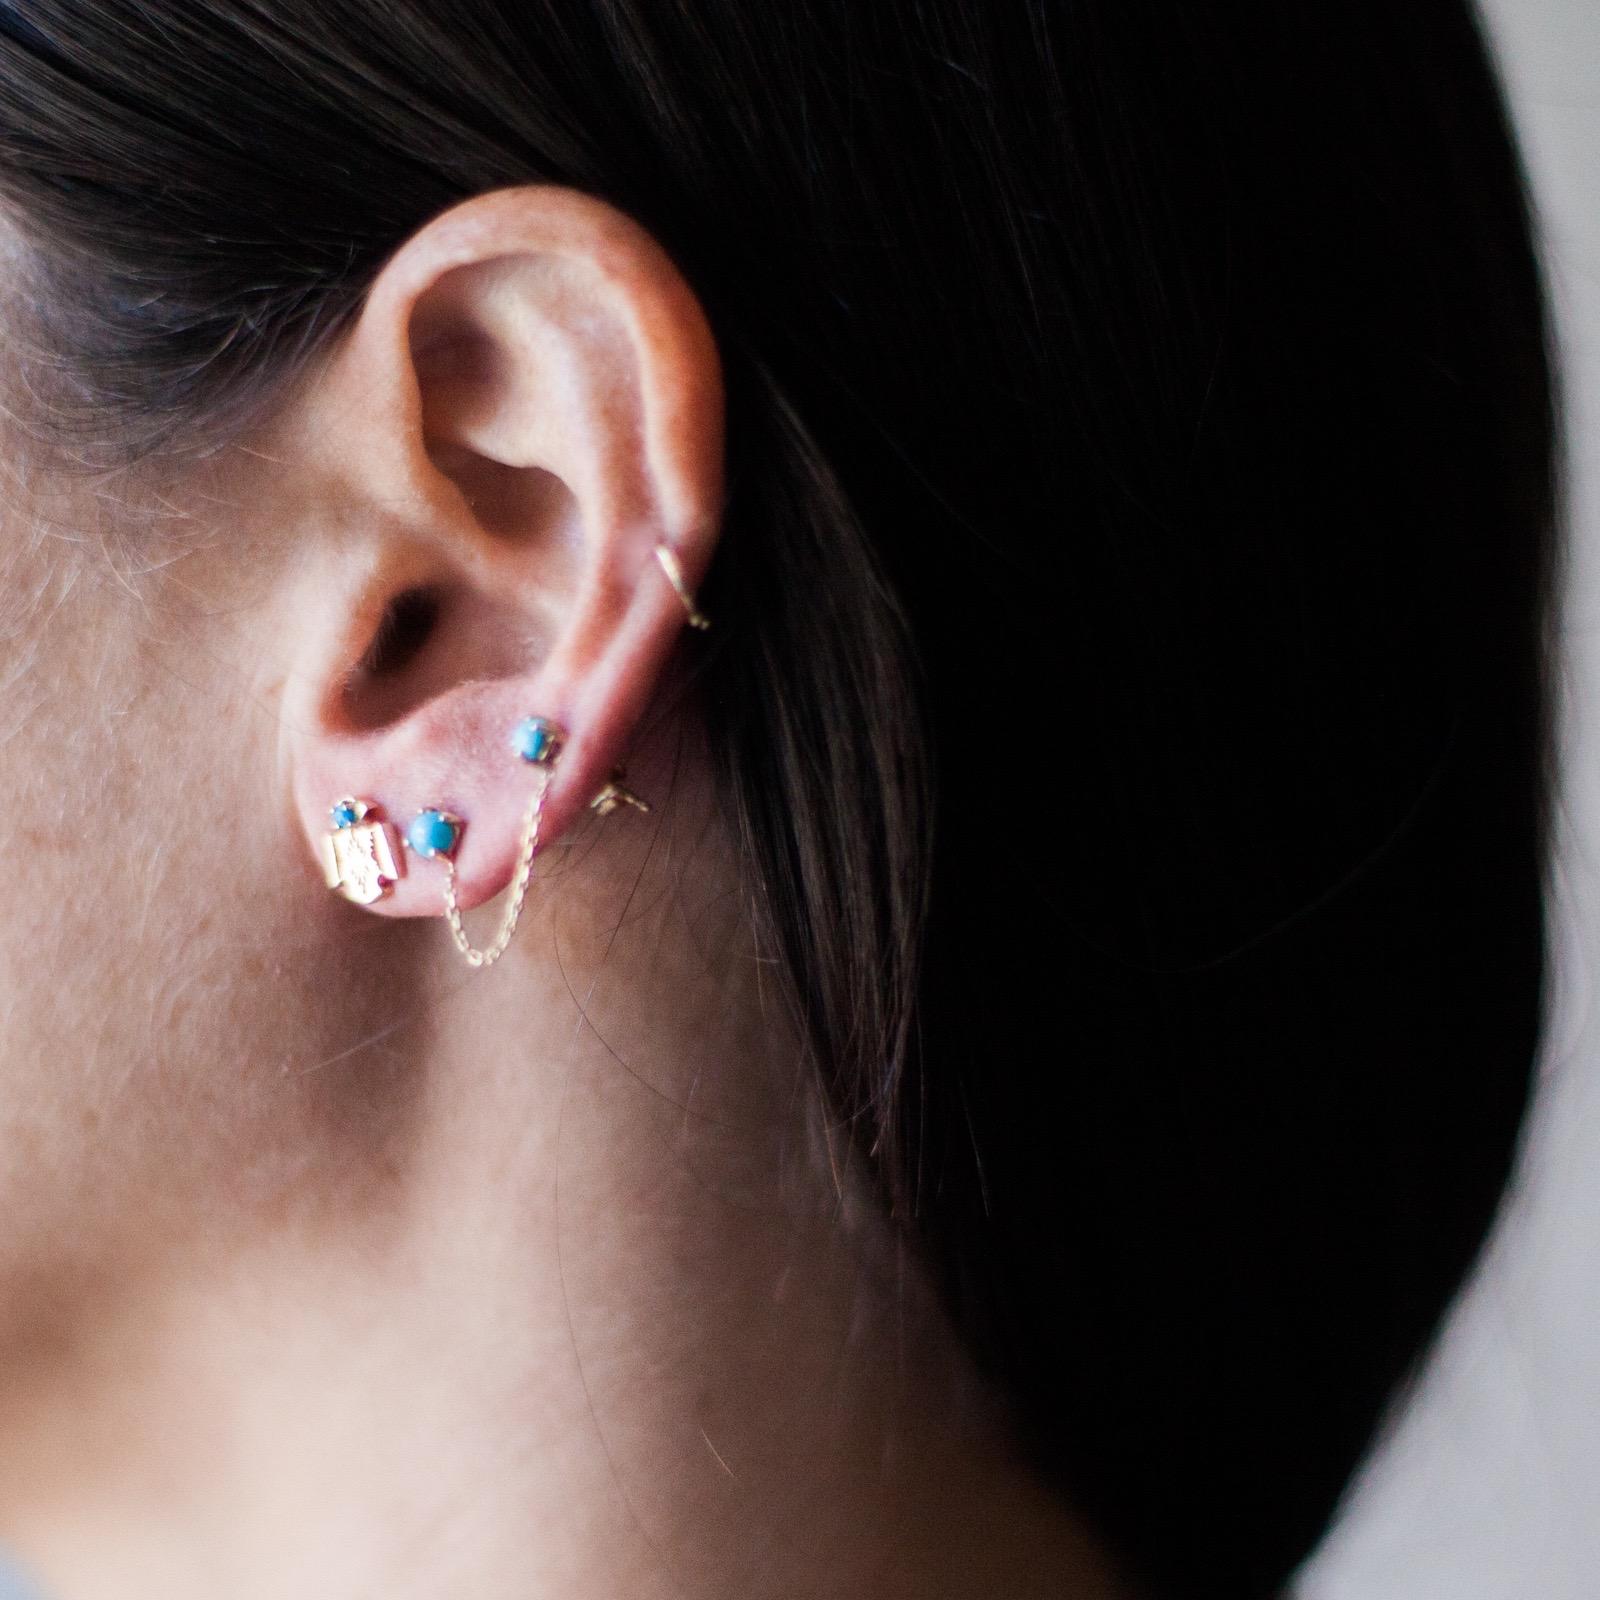 thunderbird stud and chain earring.jpg